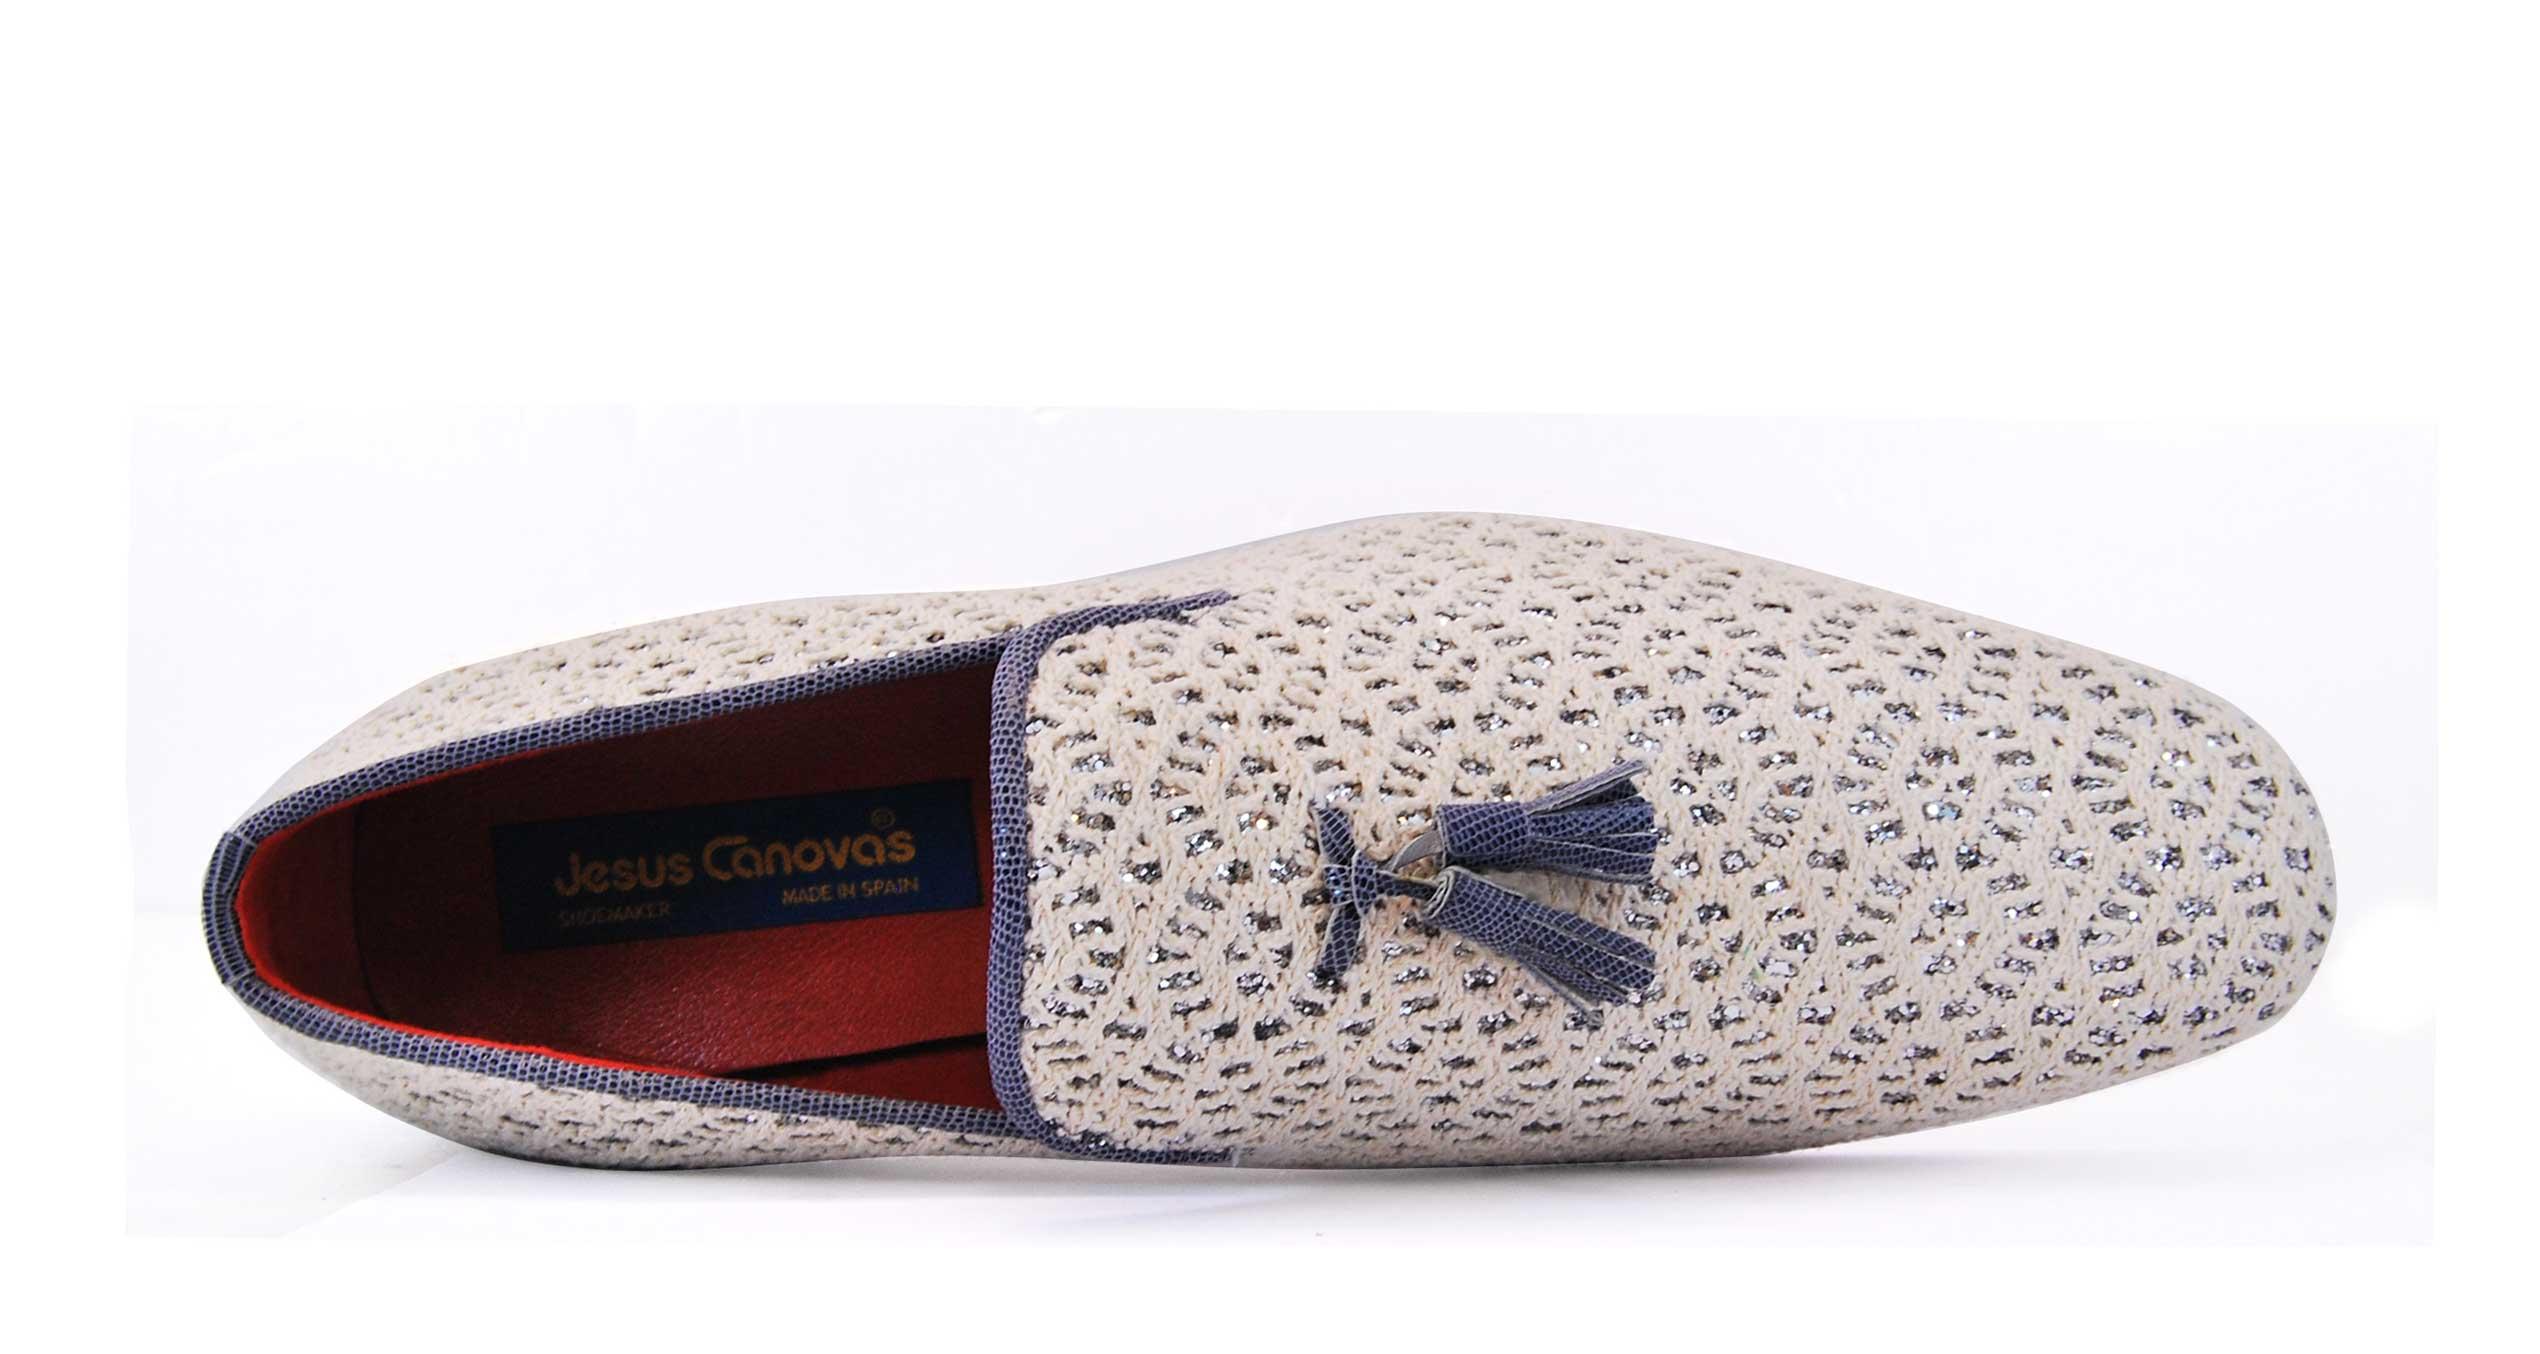 Foto 2 de Zapato Blanco Con Borla Cuero